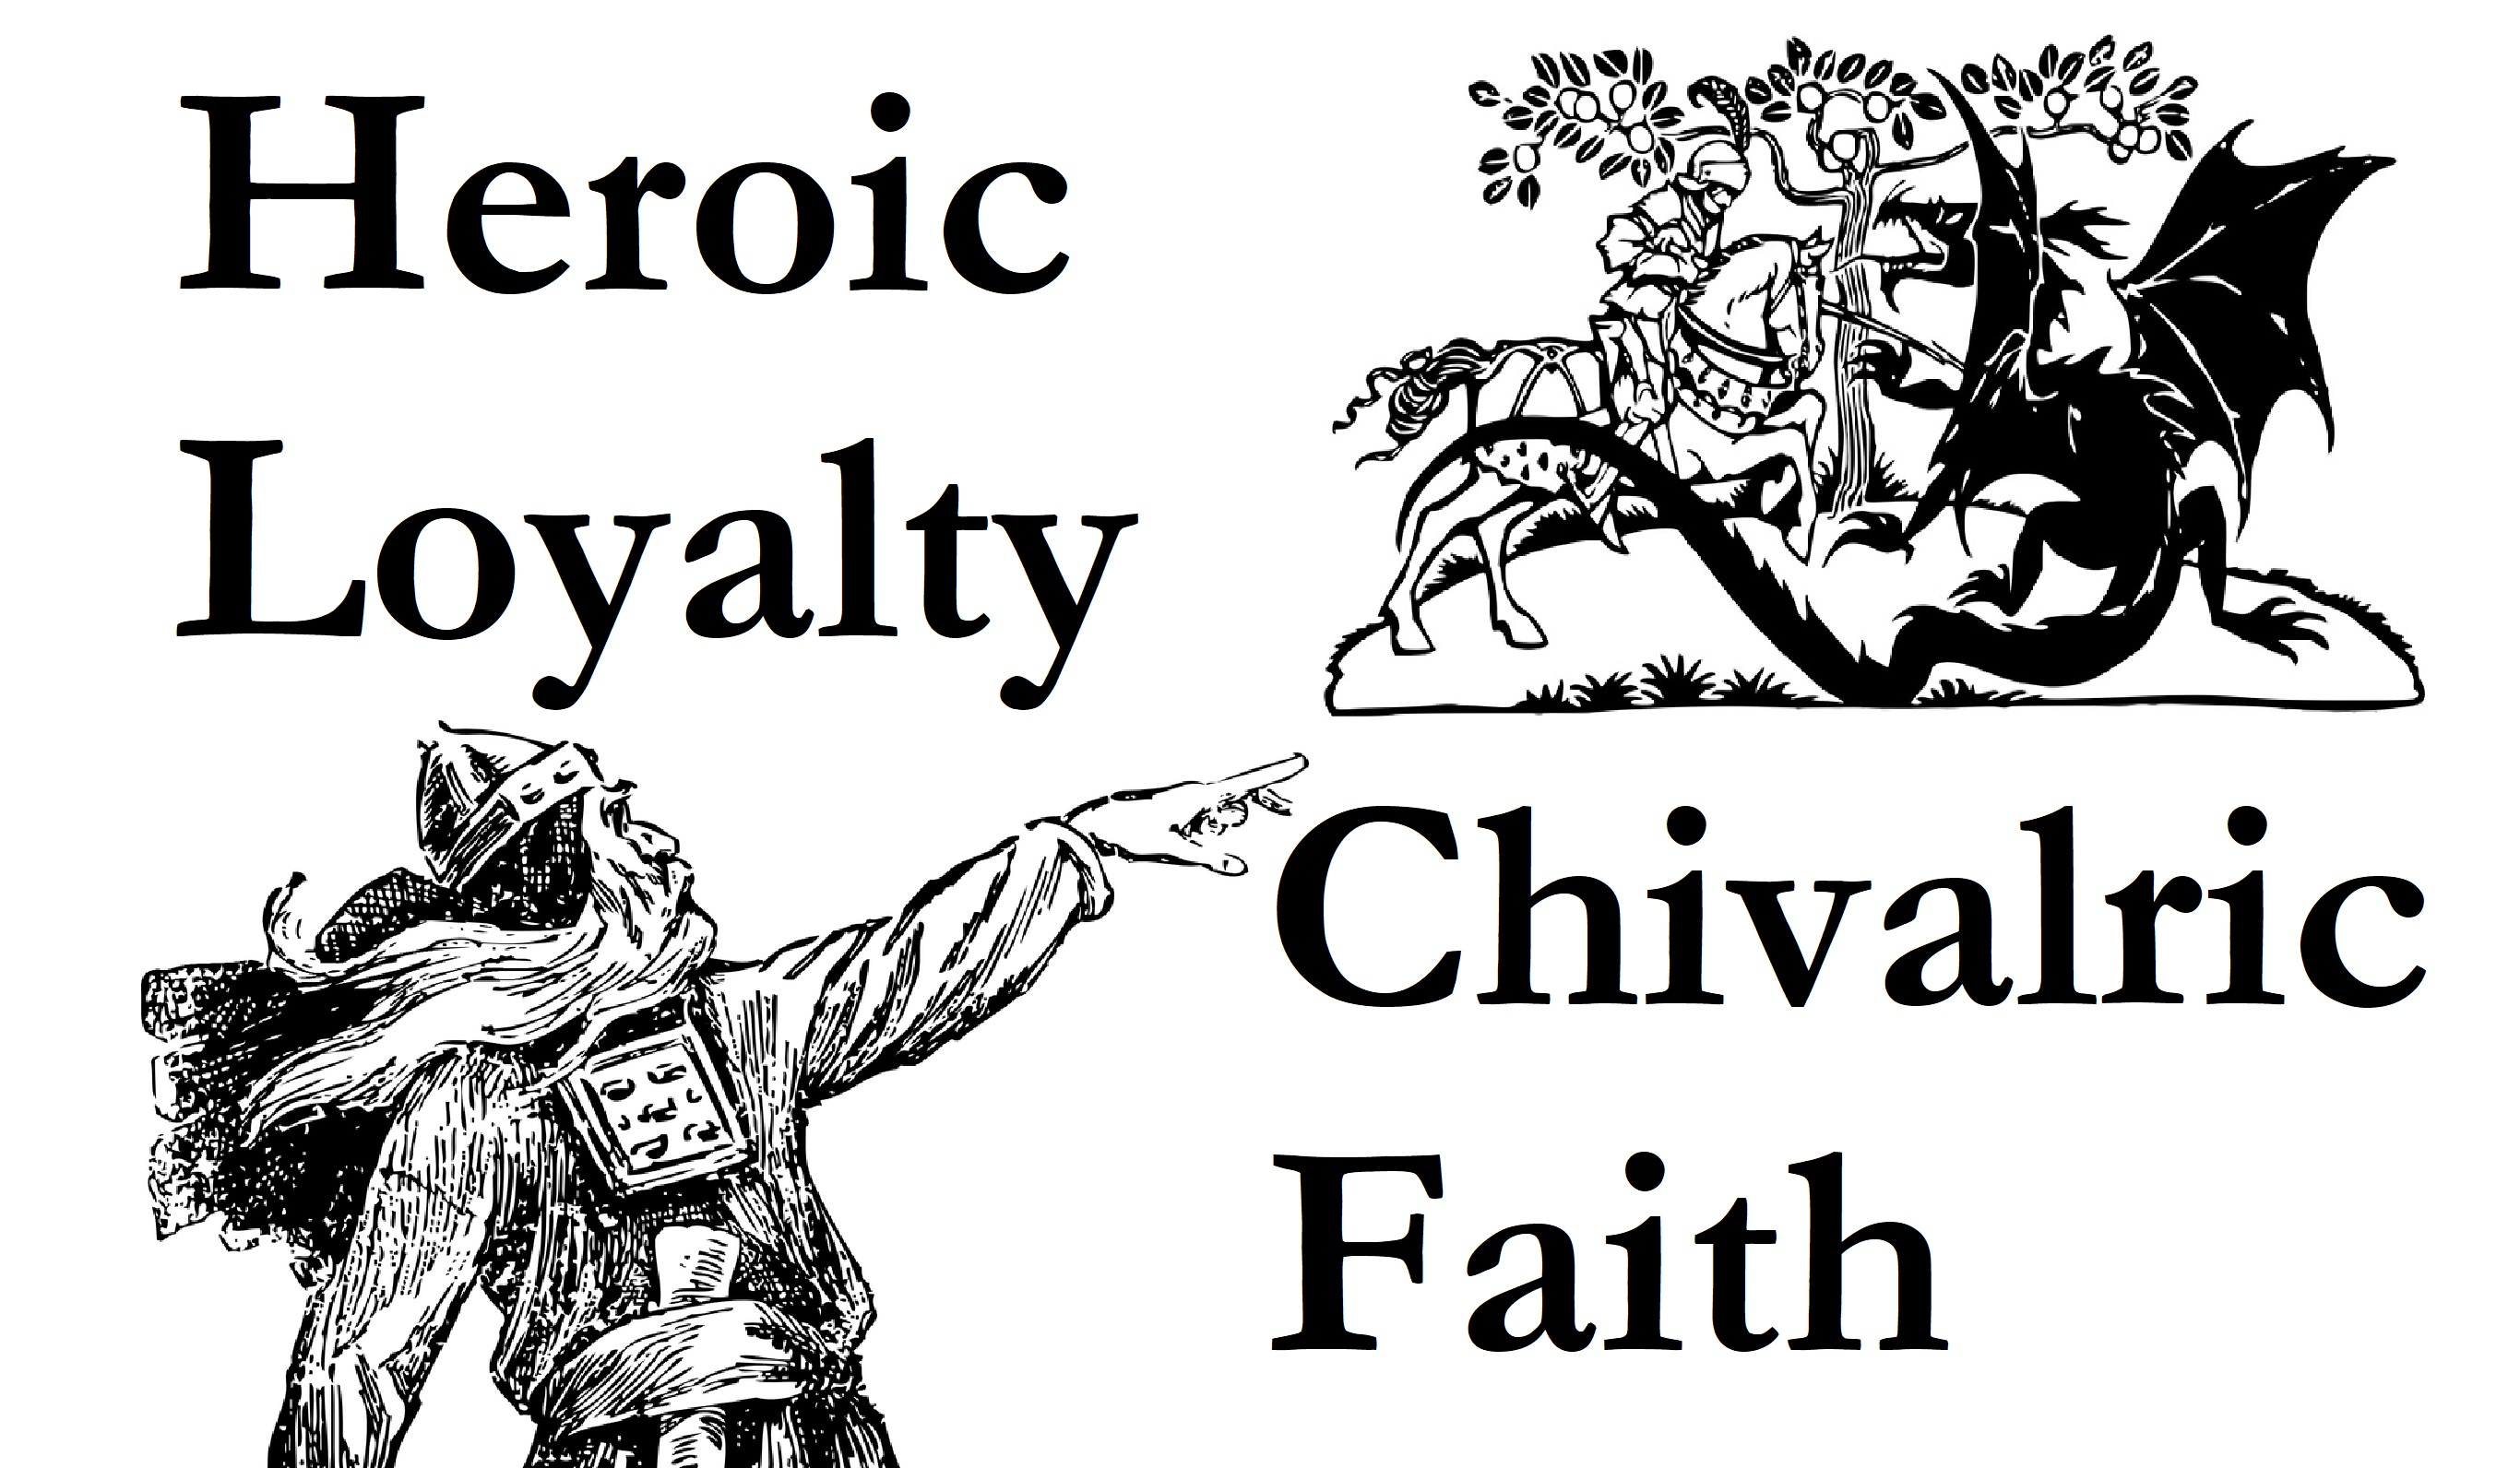 chivalry vs heroism in medieval literature